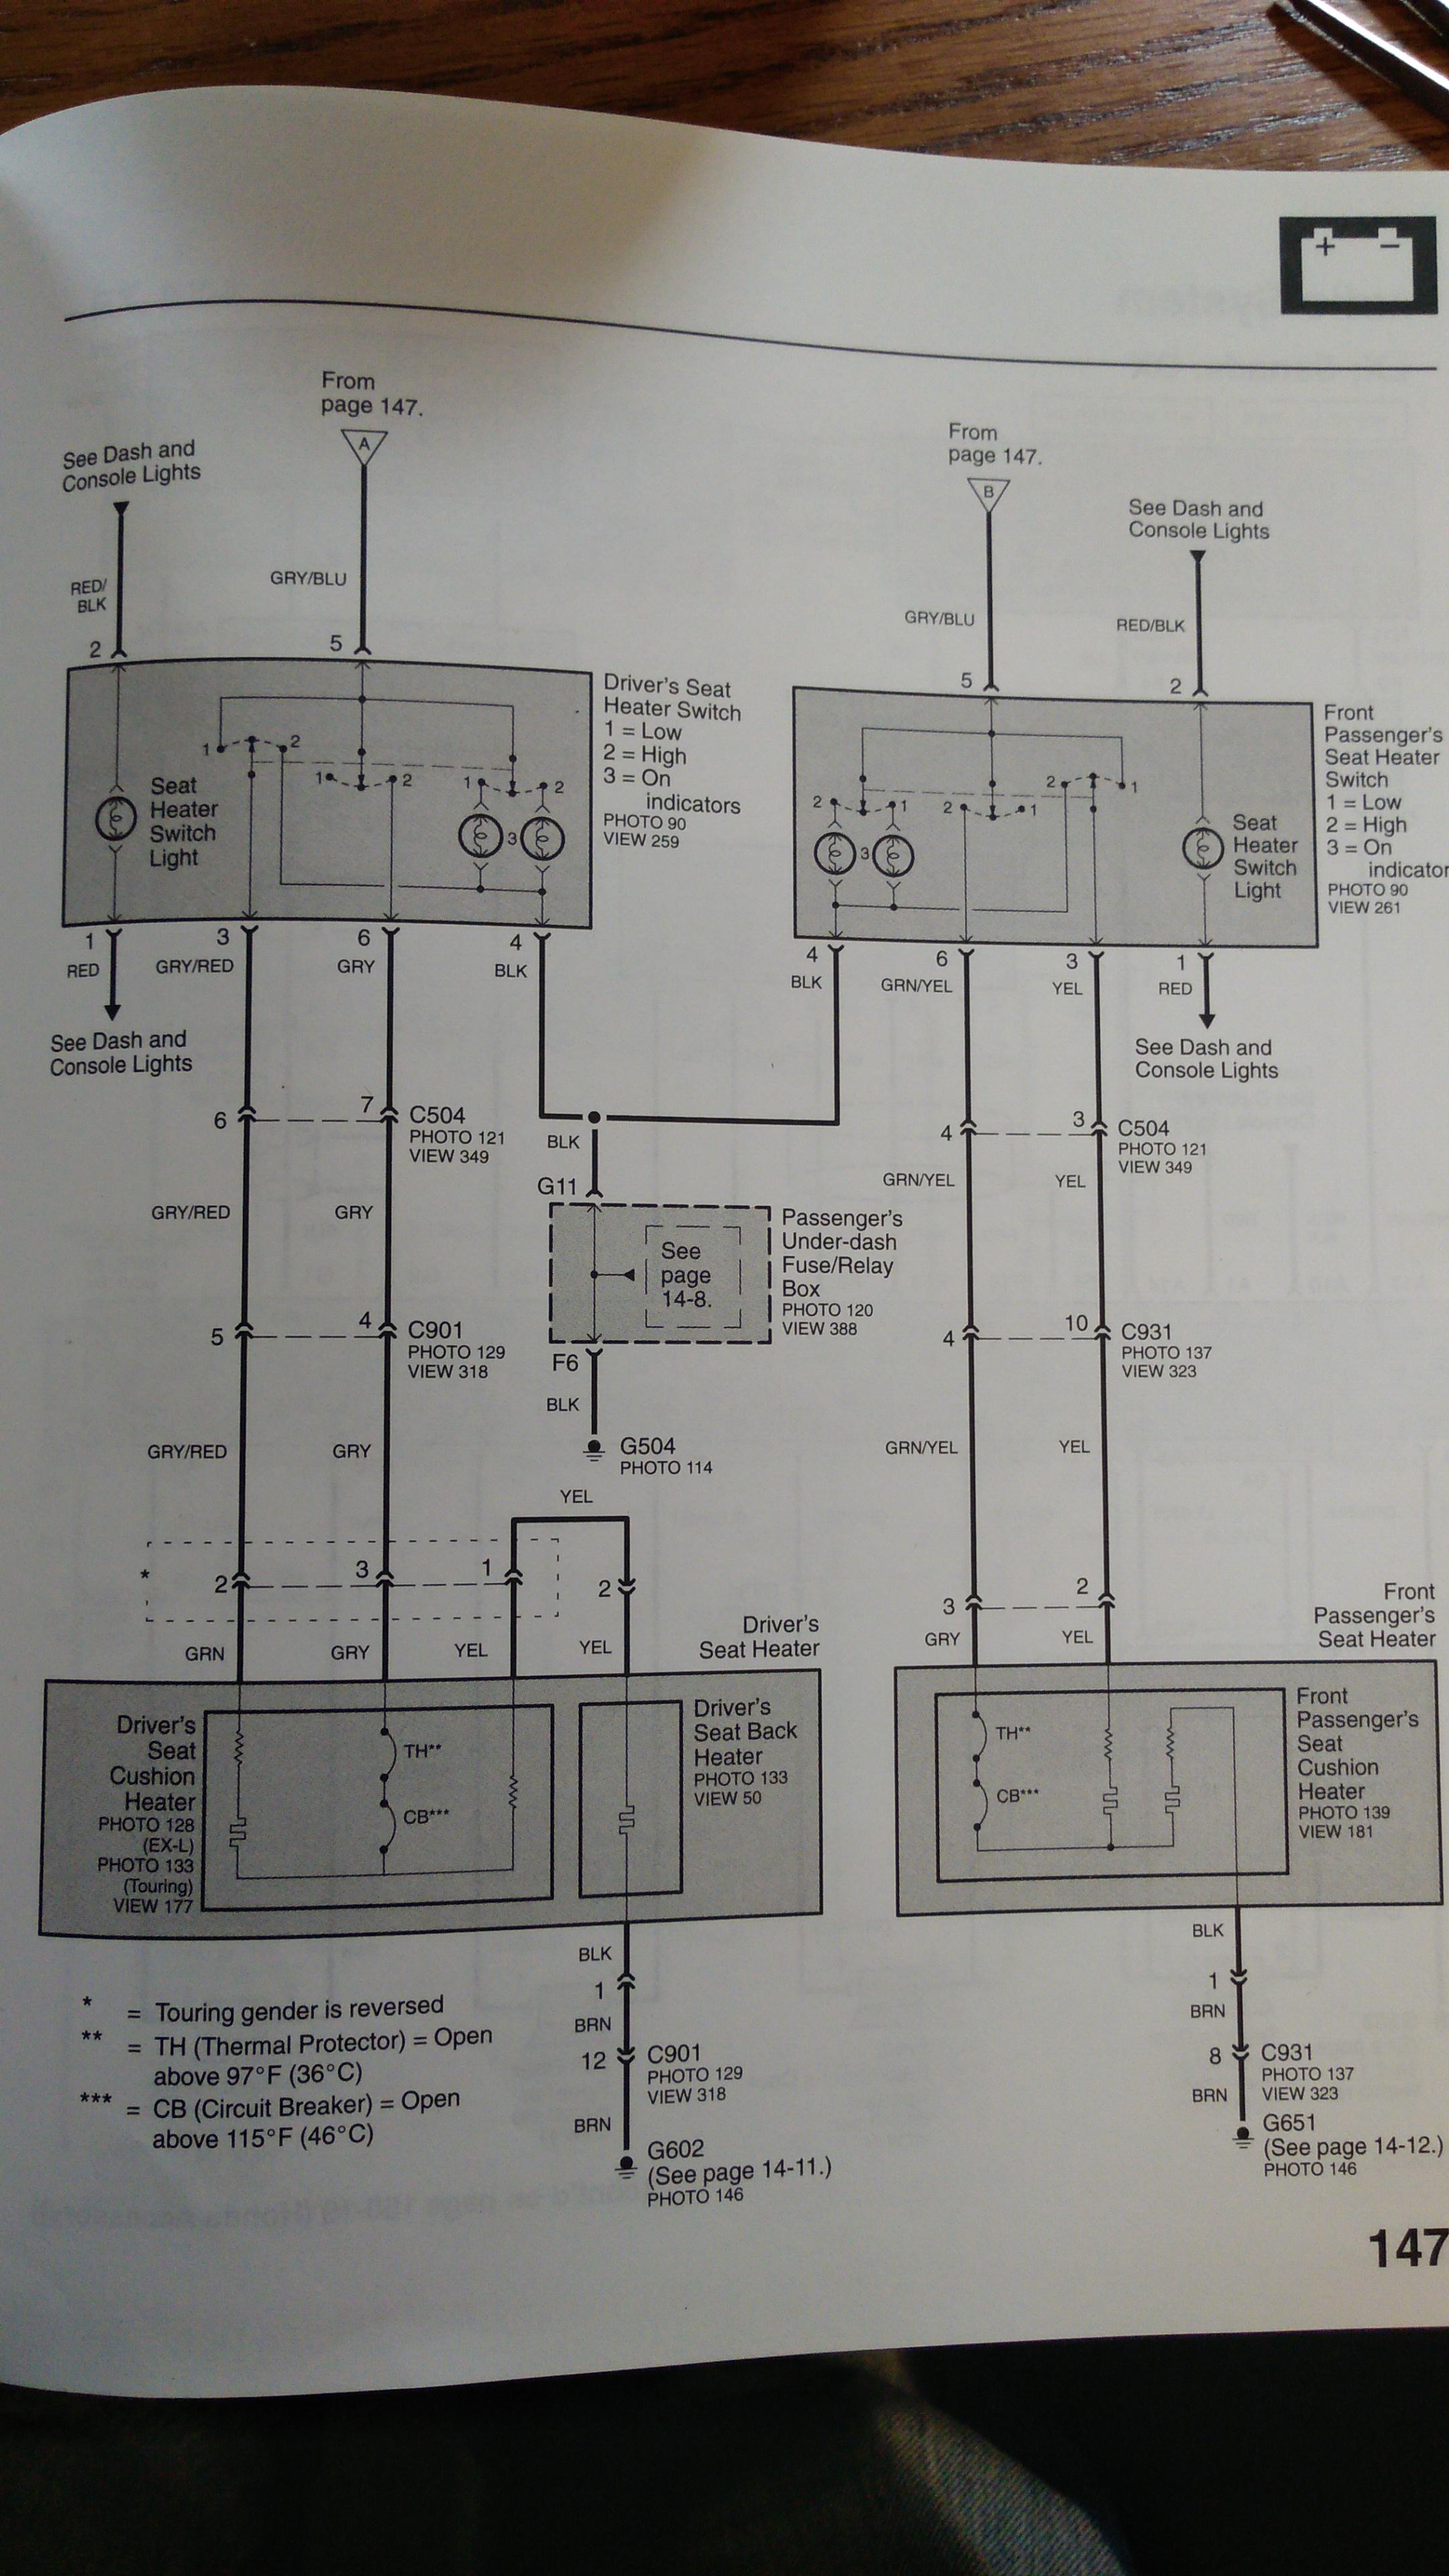 2002 Honda Odyssey Power Seat Wiring Diagram Scotts L1742 Wiring Diagram For Wiring Diagram Schematics